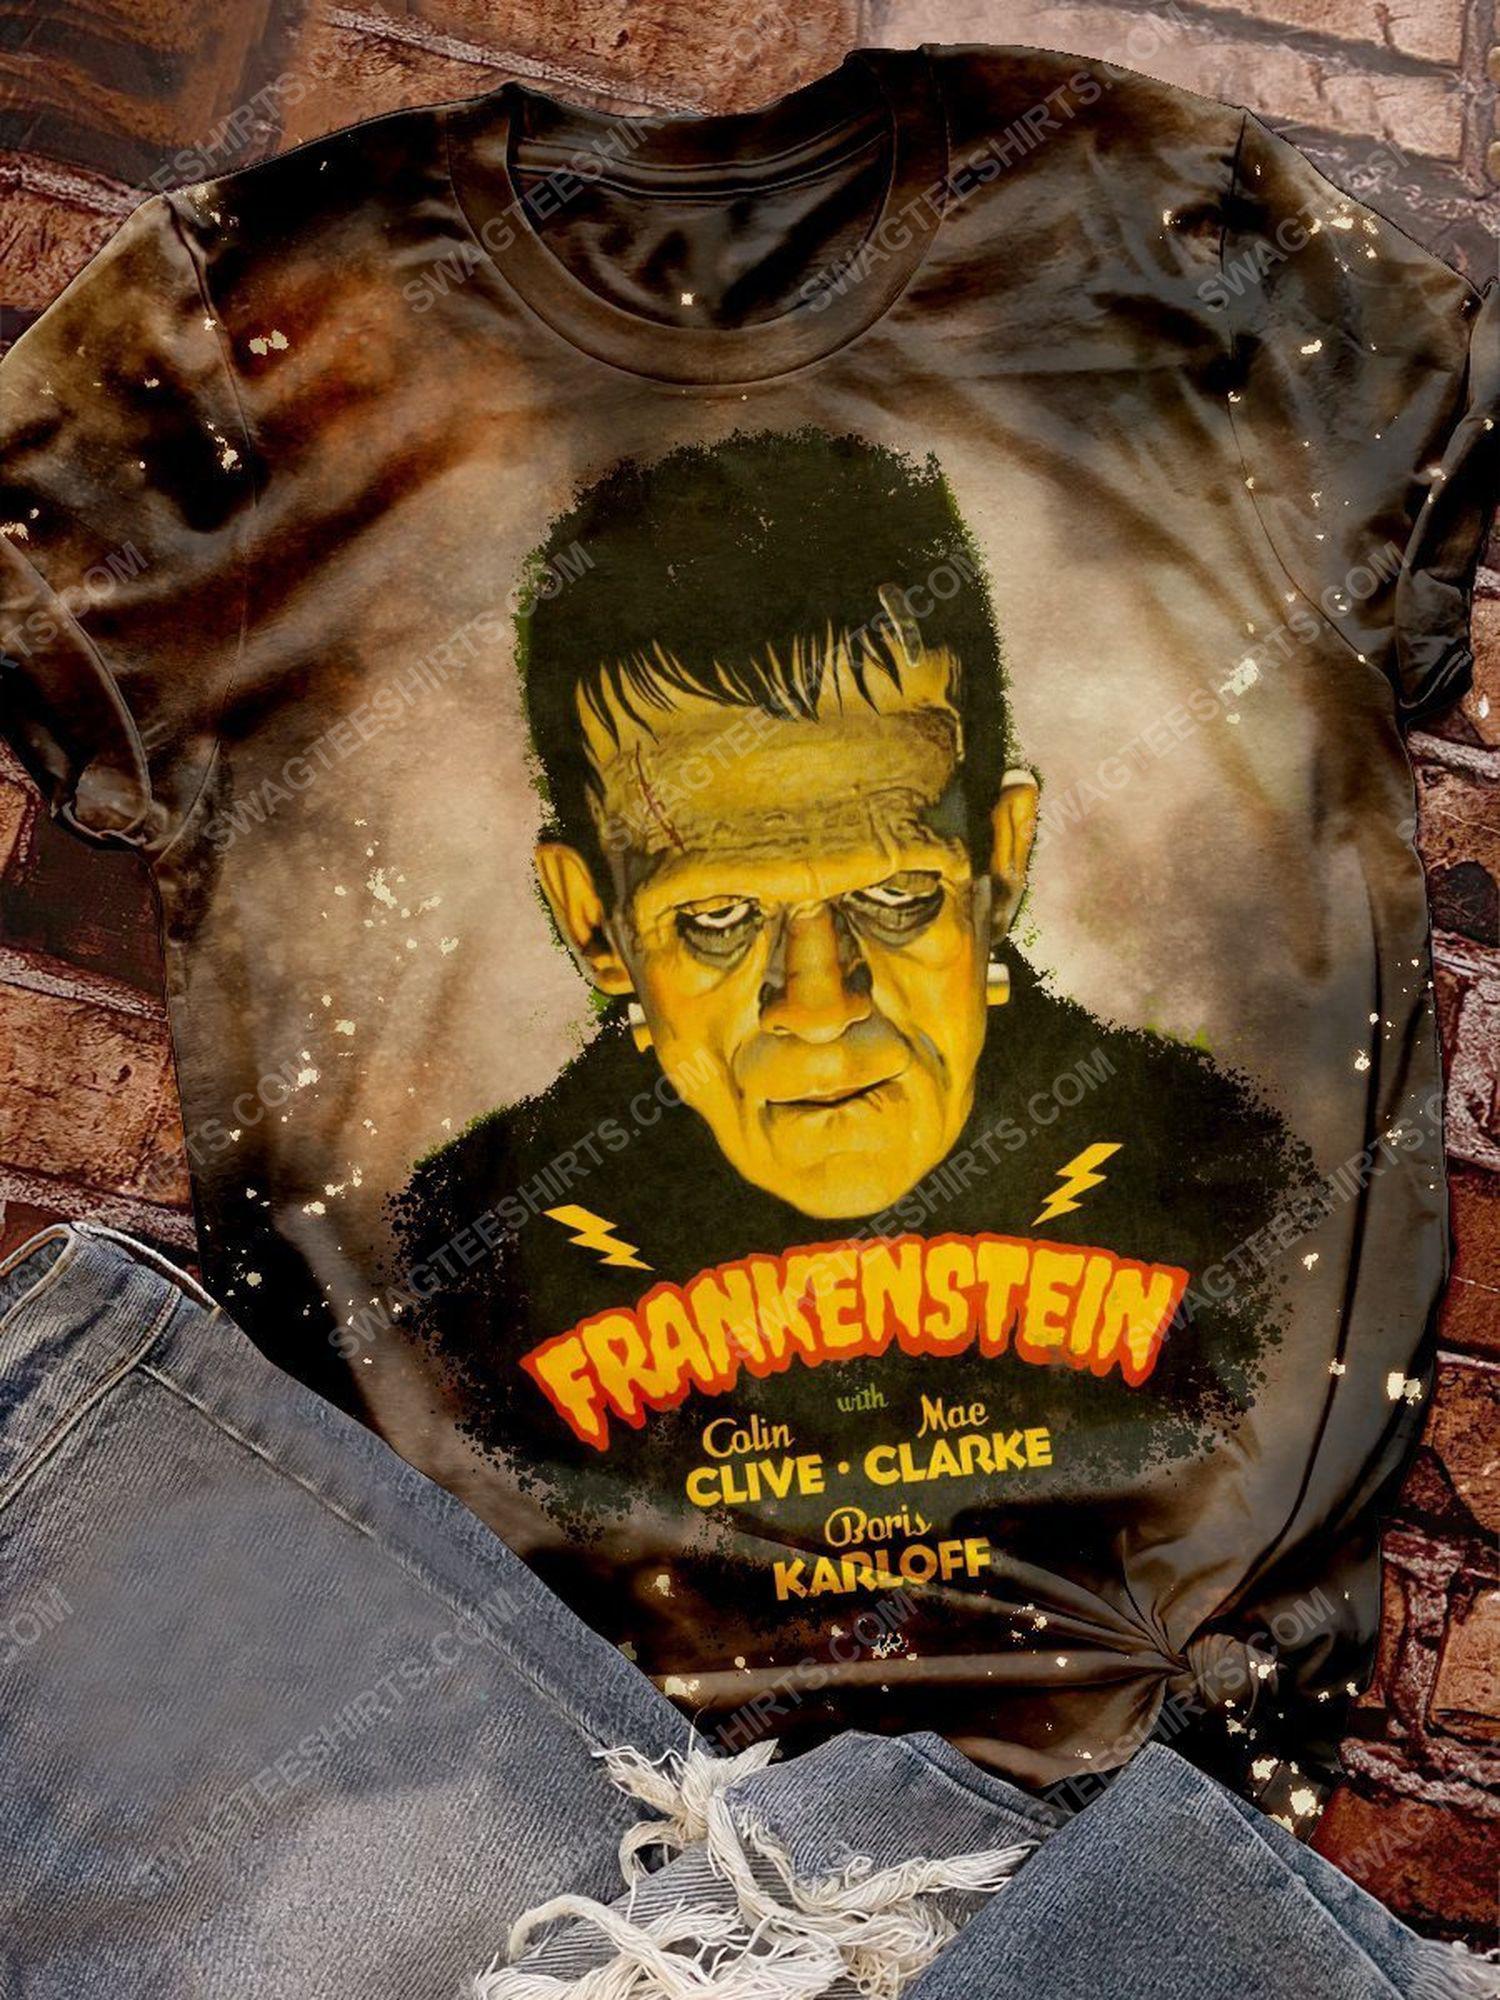 Halloween night and frankenstein movie bleached shirt 1 - Copy (2)